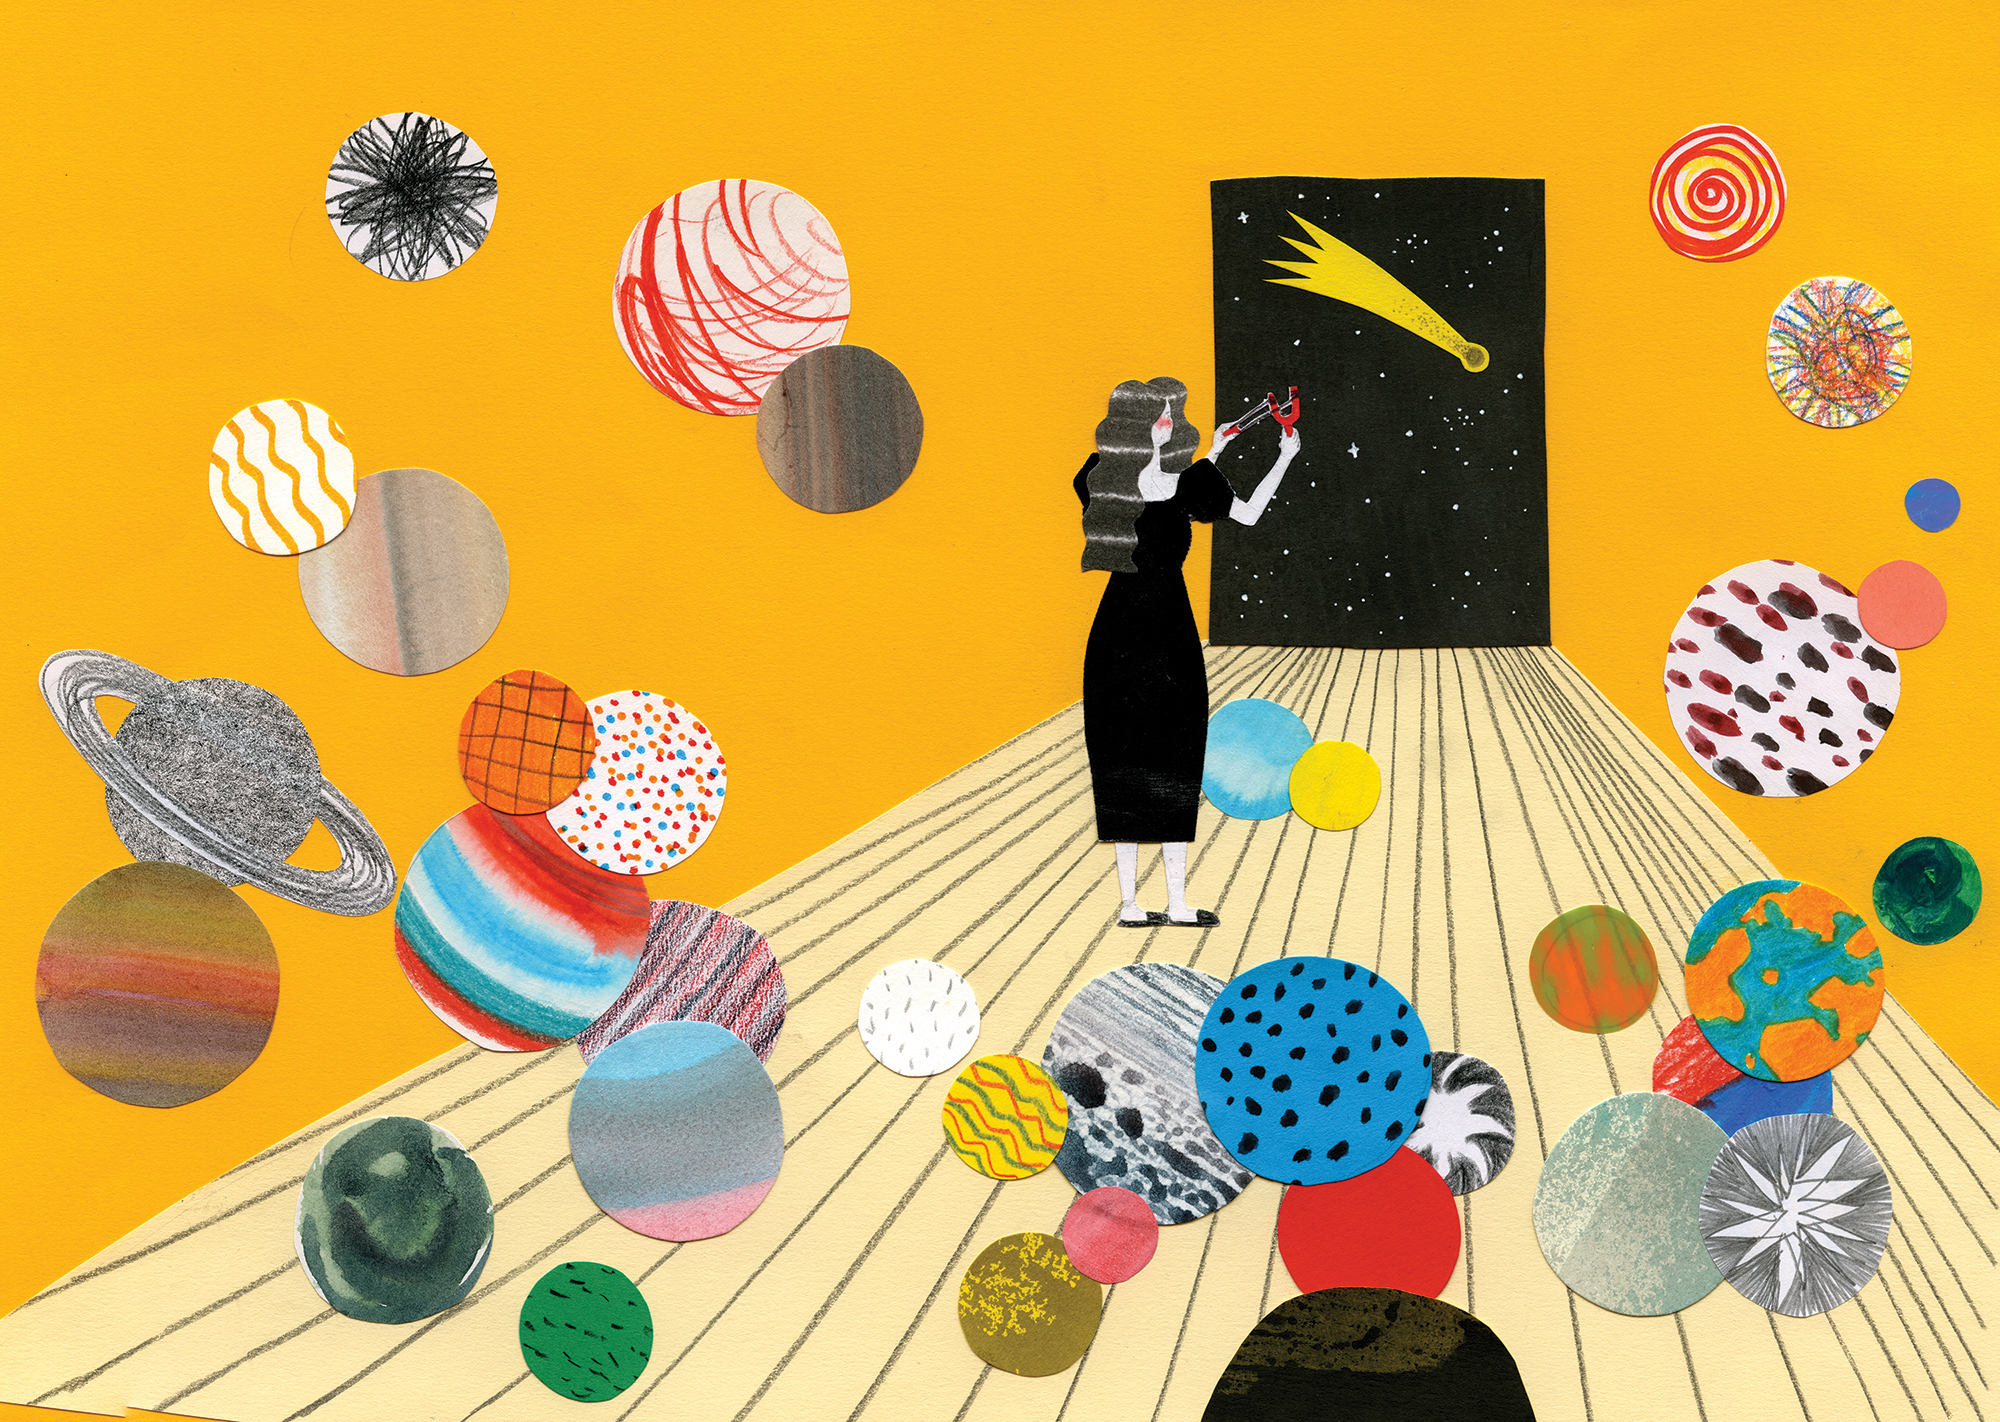 AI 33 2014, SOI 56 2013 - ARTIST: Hye Jin ChungTITLE: Planet Collector